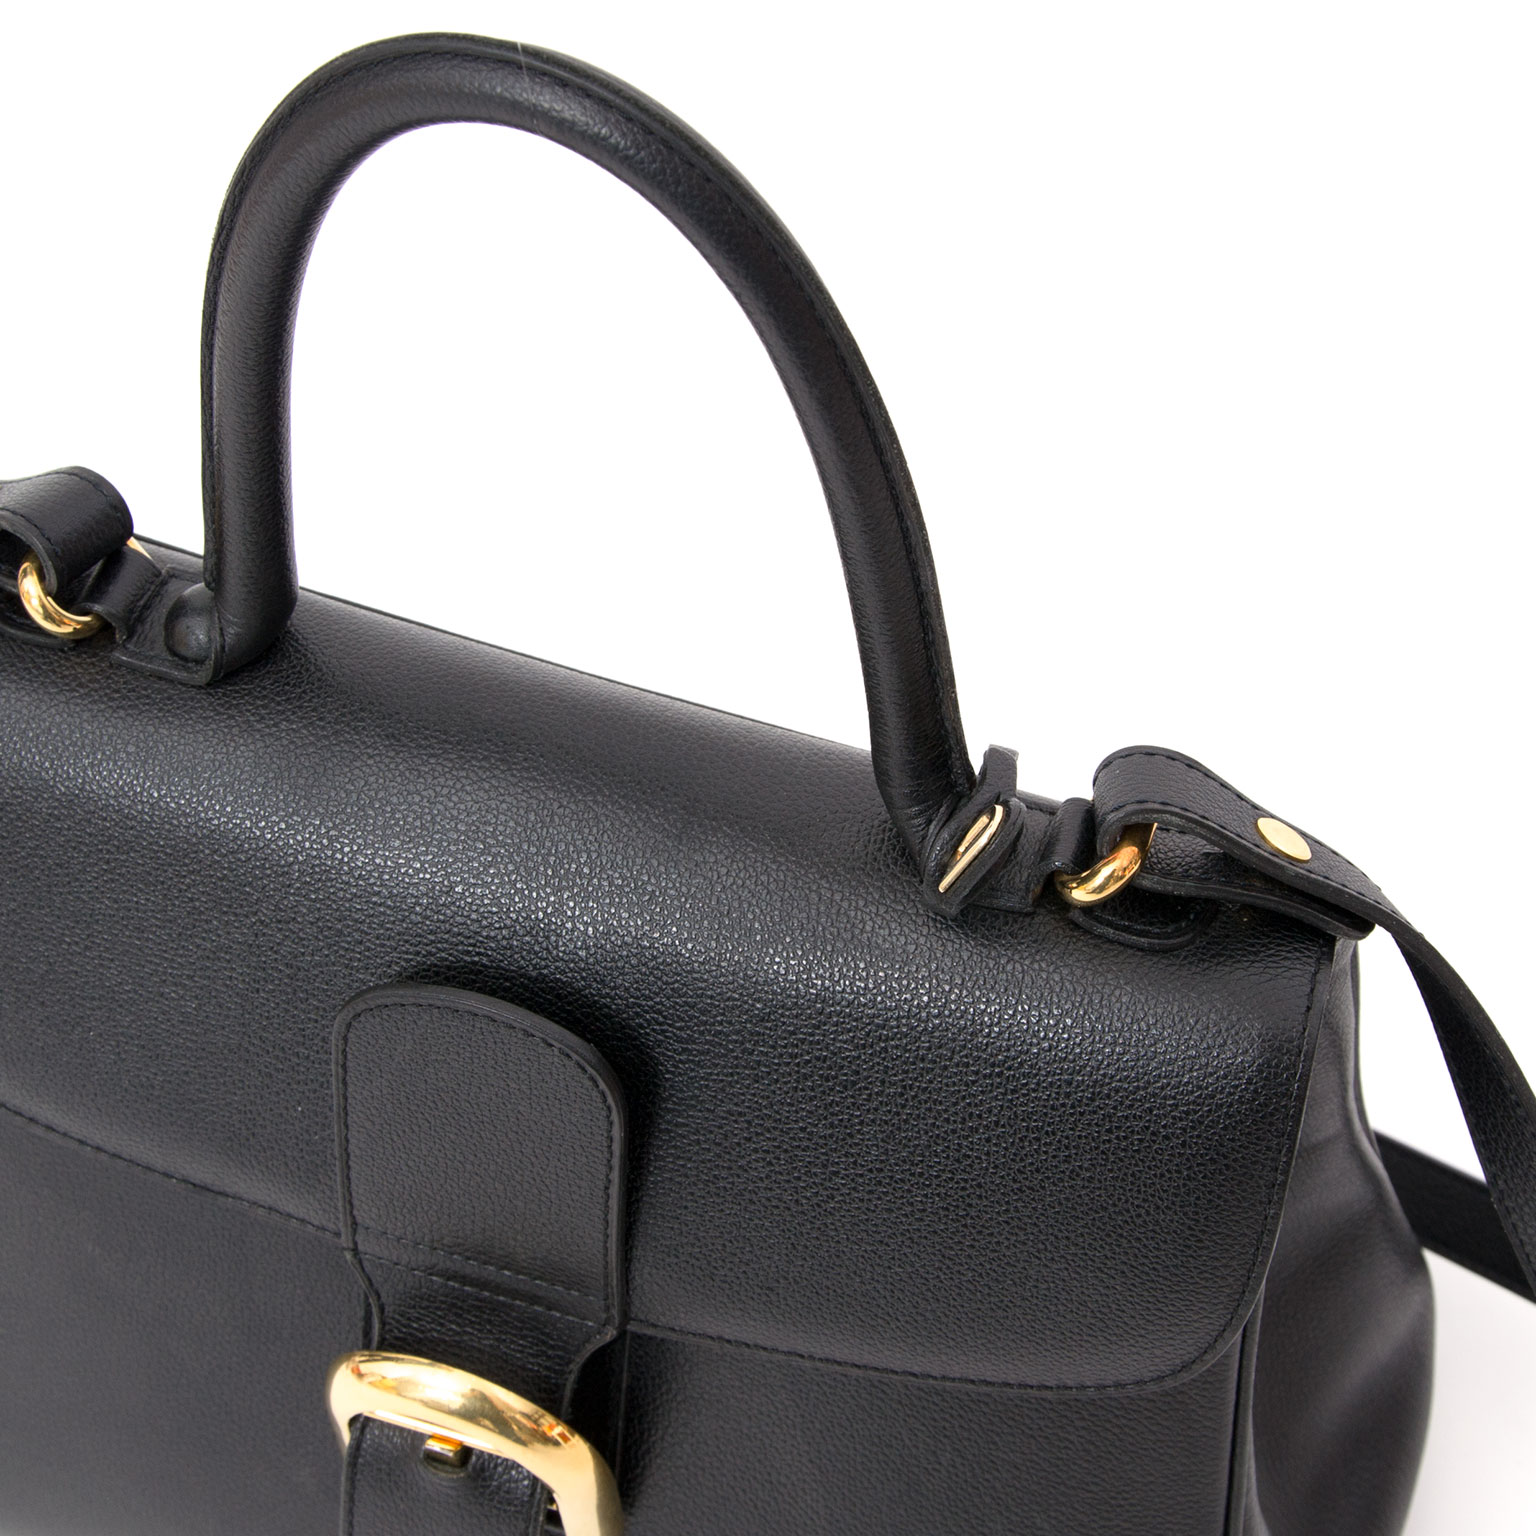 78661a91fe5 ... Delvaux Black Brillant MM + STRAP tweedehands te koop lablellov.com  veilig